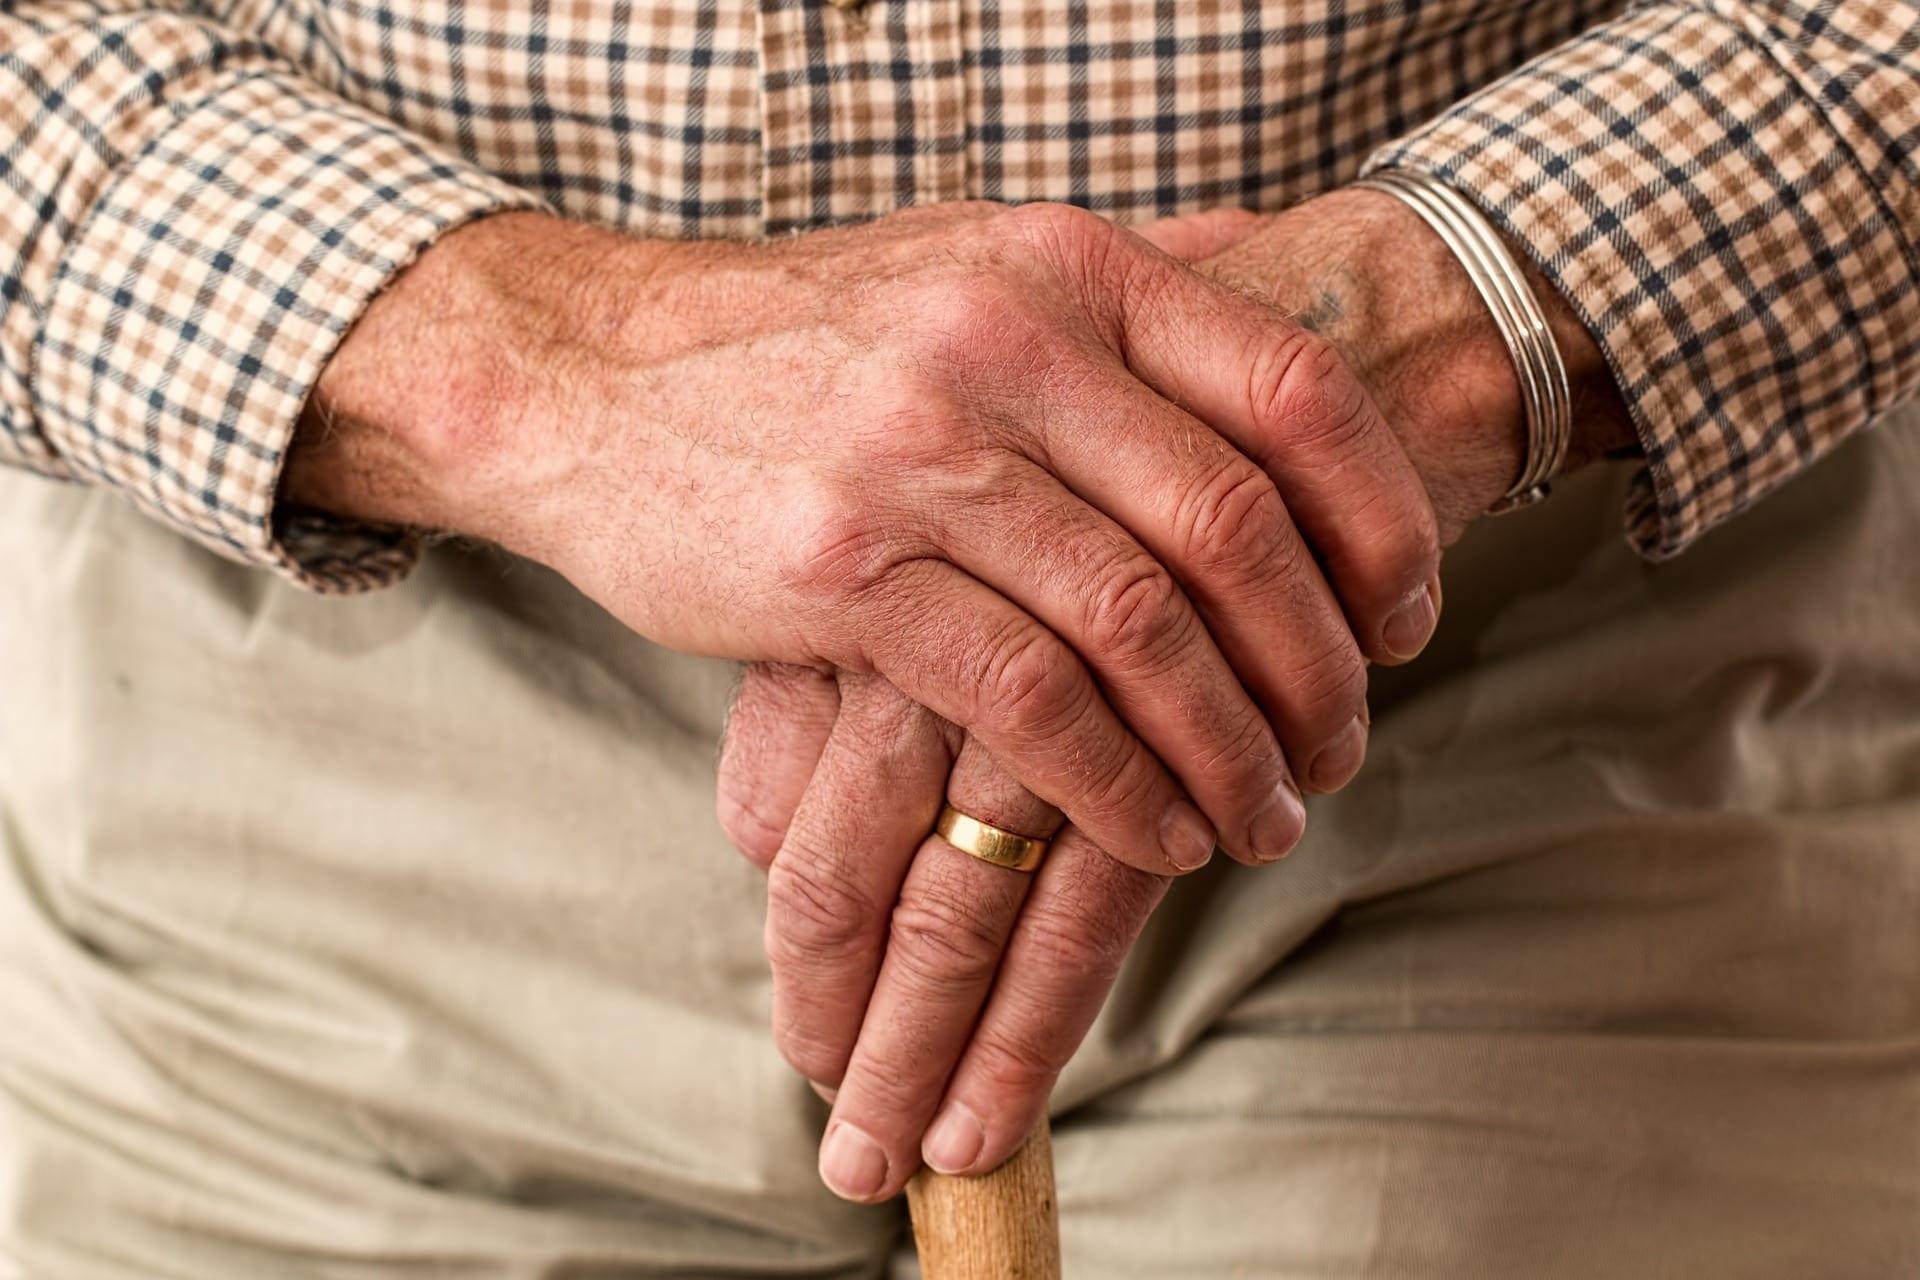 Elderly man with walking stick; image by stevepb, via Pixabay, CC0.